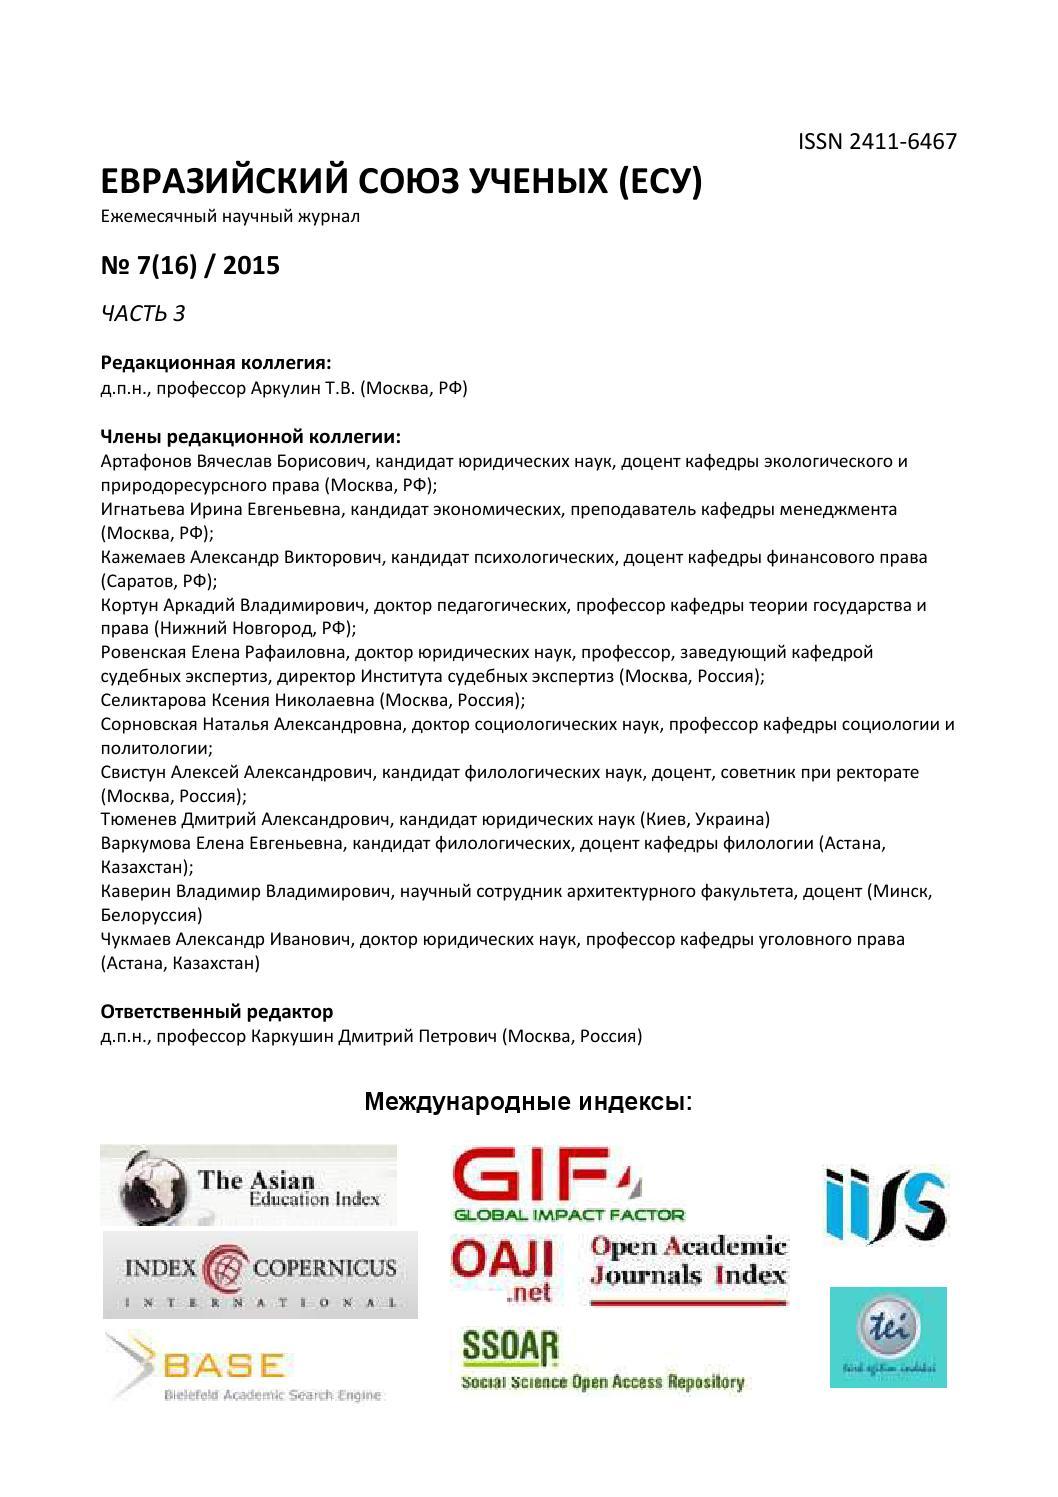 Evro 16 p3 tech med filos khim by euroasia science - issuu 6d3ef9f783c